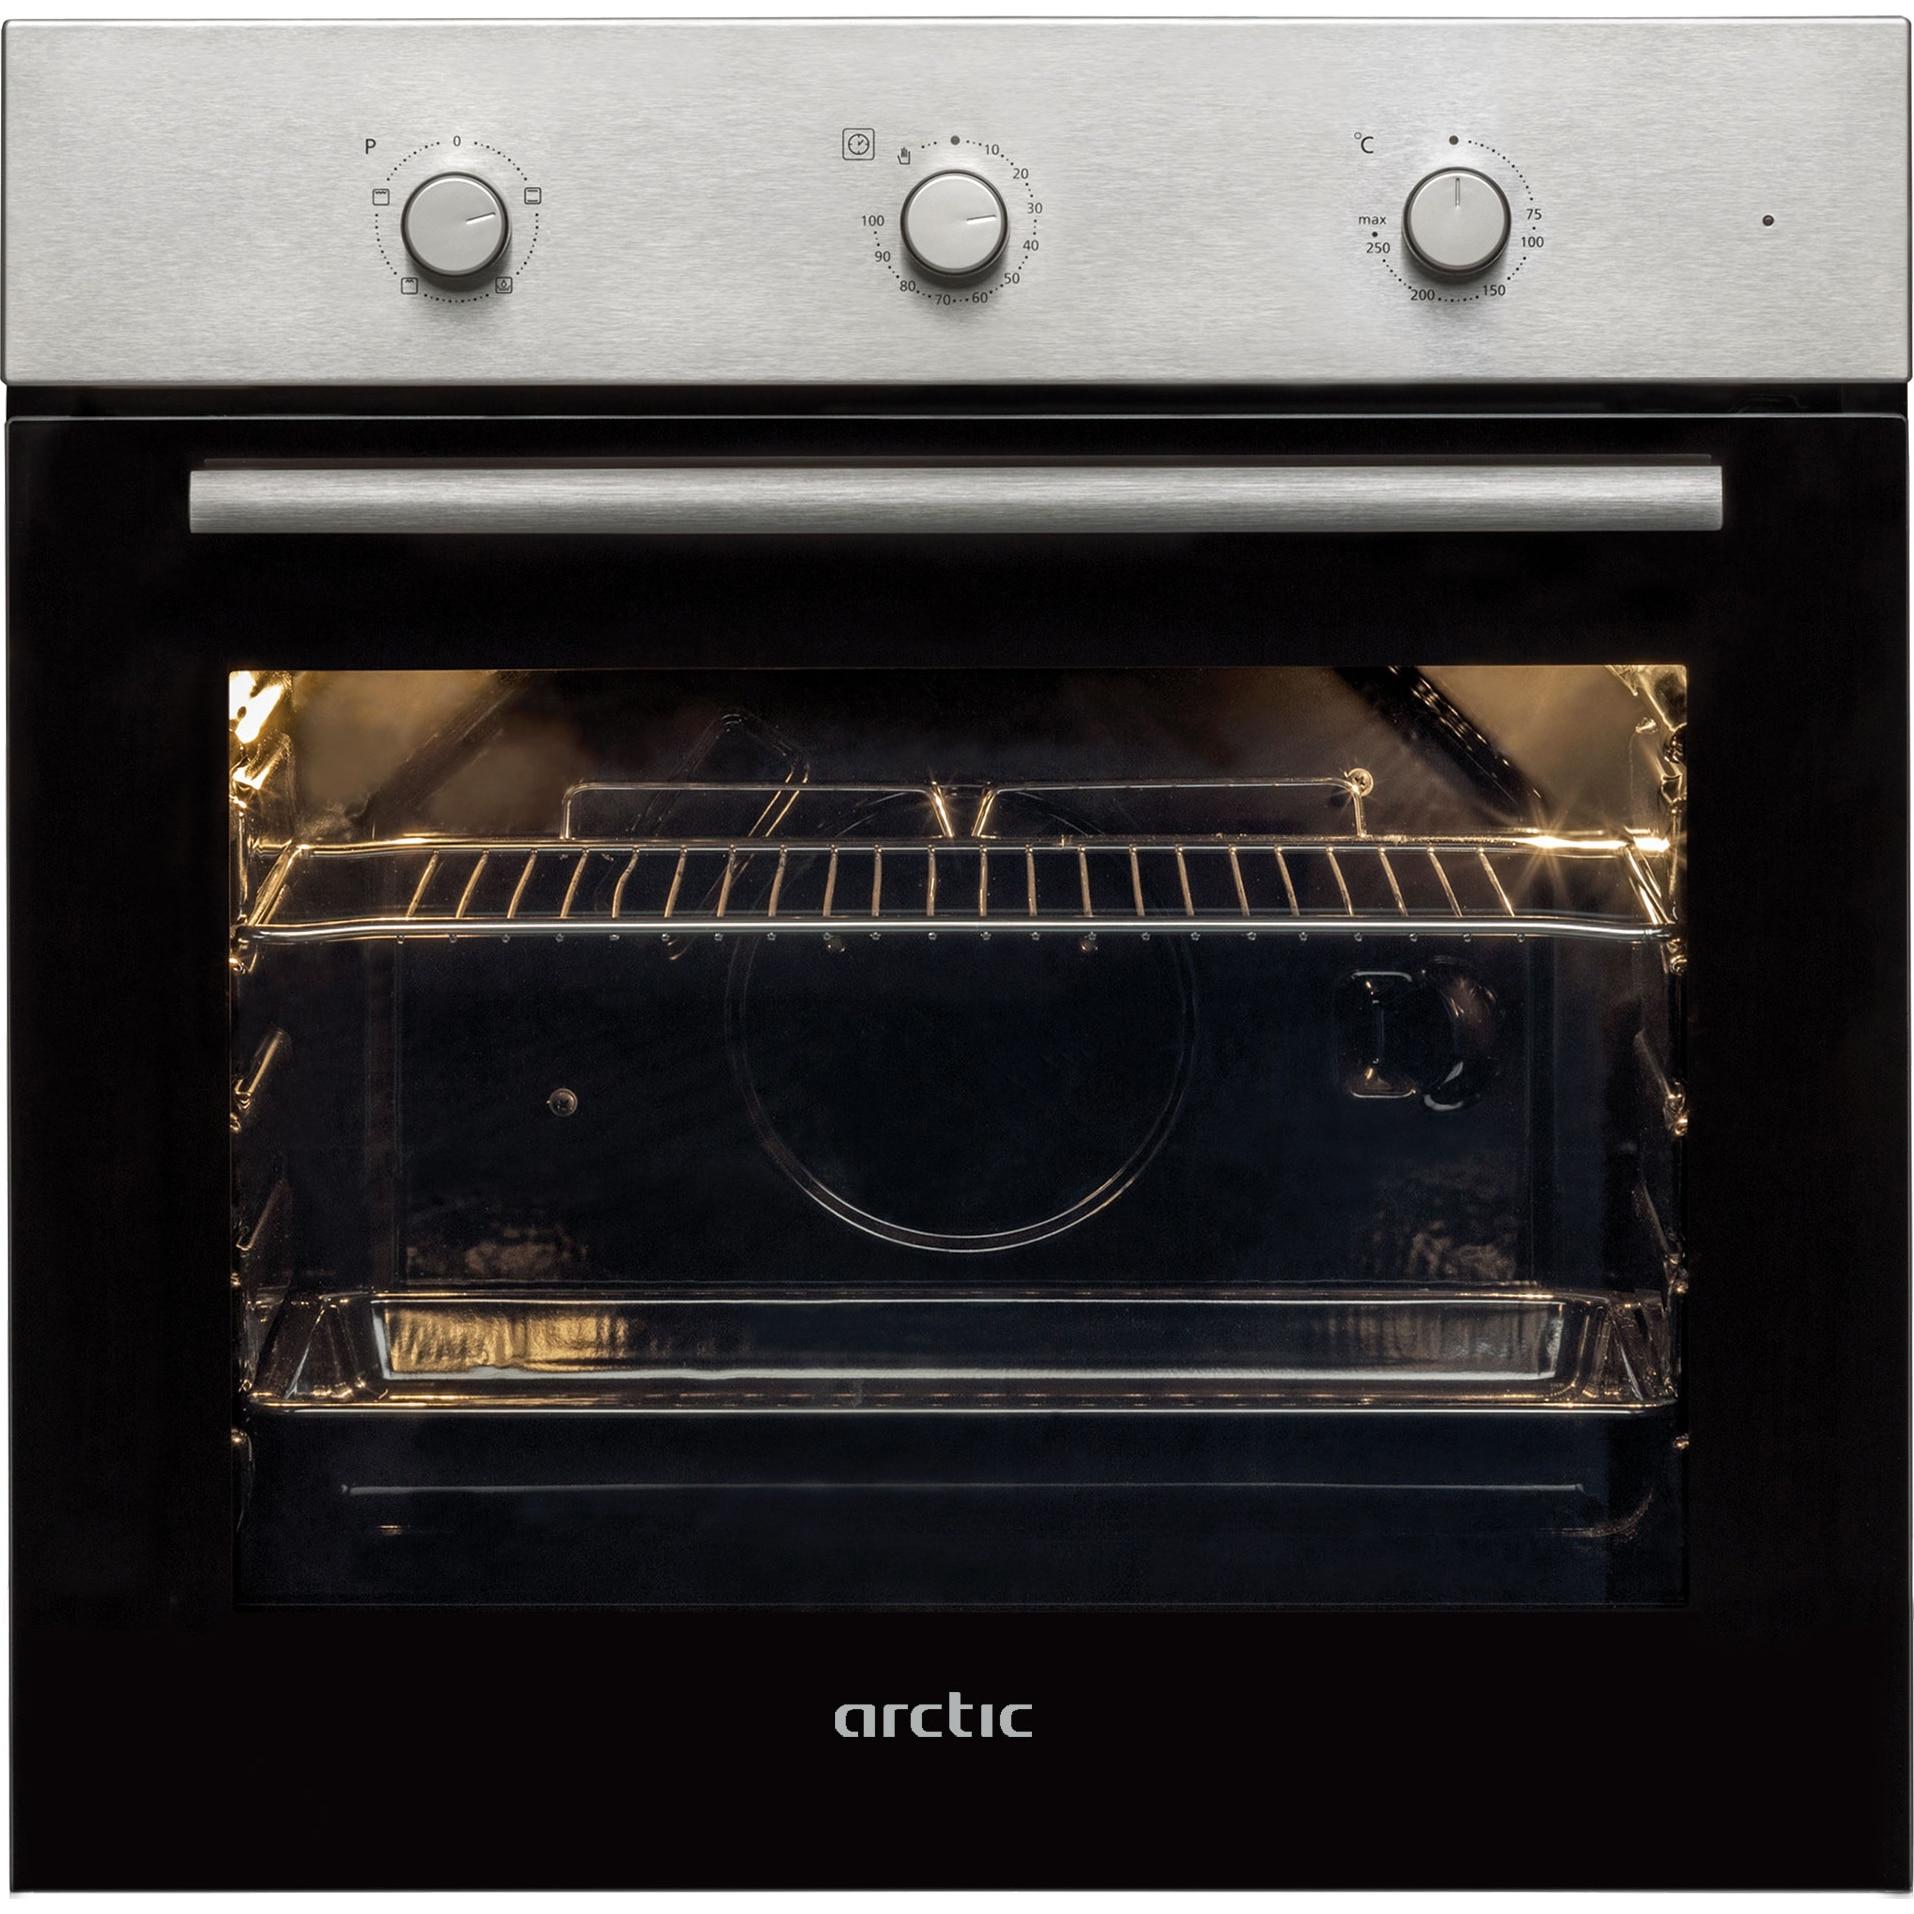 Fotografie Cuptor incorporabil Arctic AROIC21100H, Electric, Timer, Autocuratare Aqua Drop Clean, 71 l, Clasa A, Inox